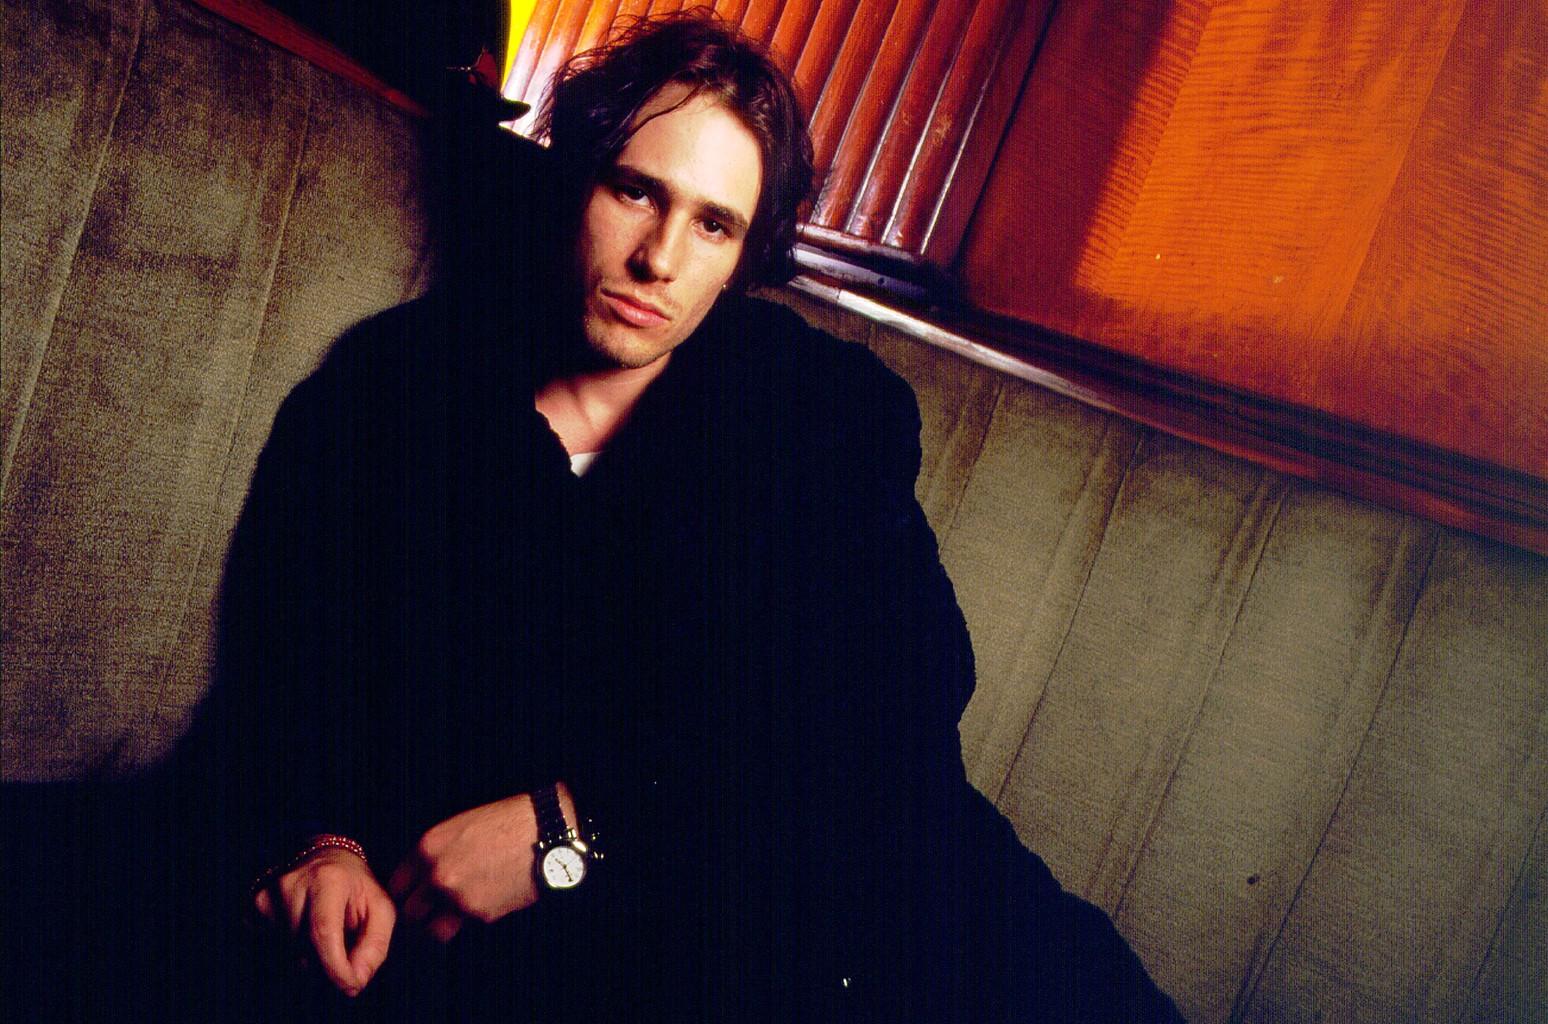 Jeff Buckley photographed in 1994